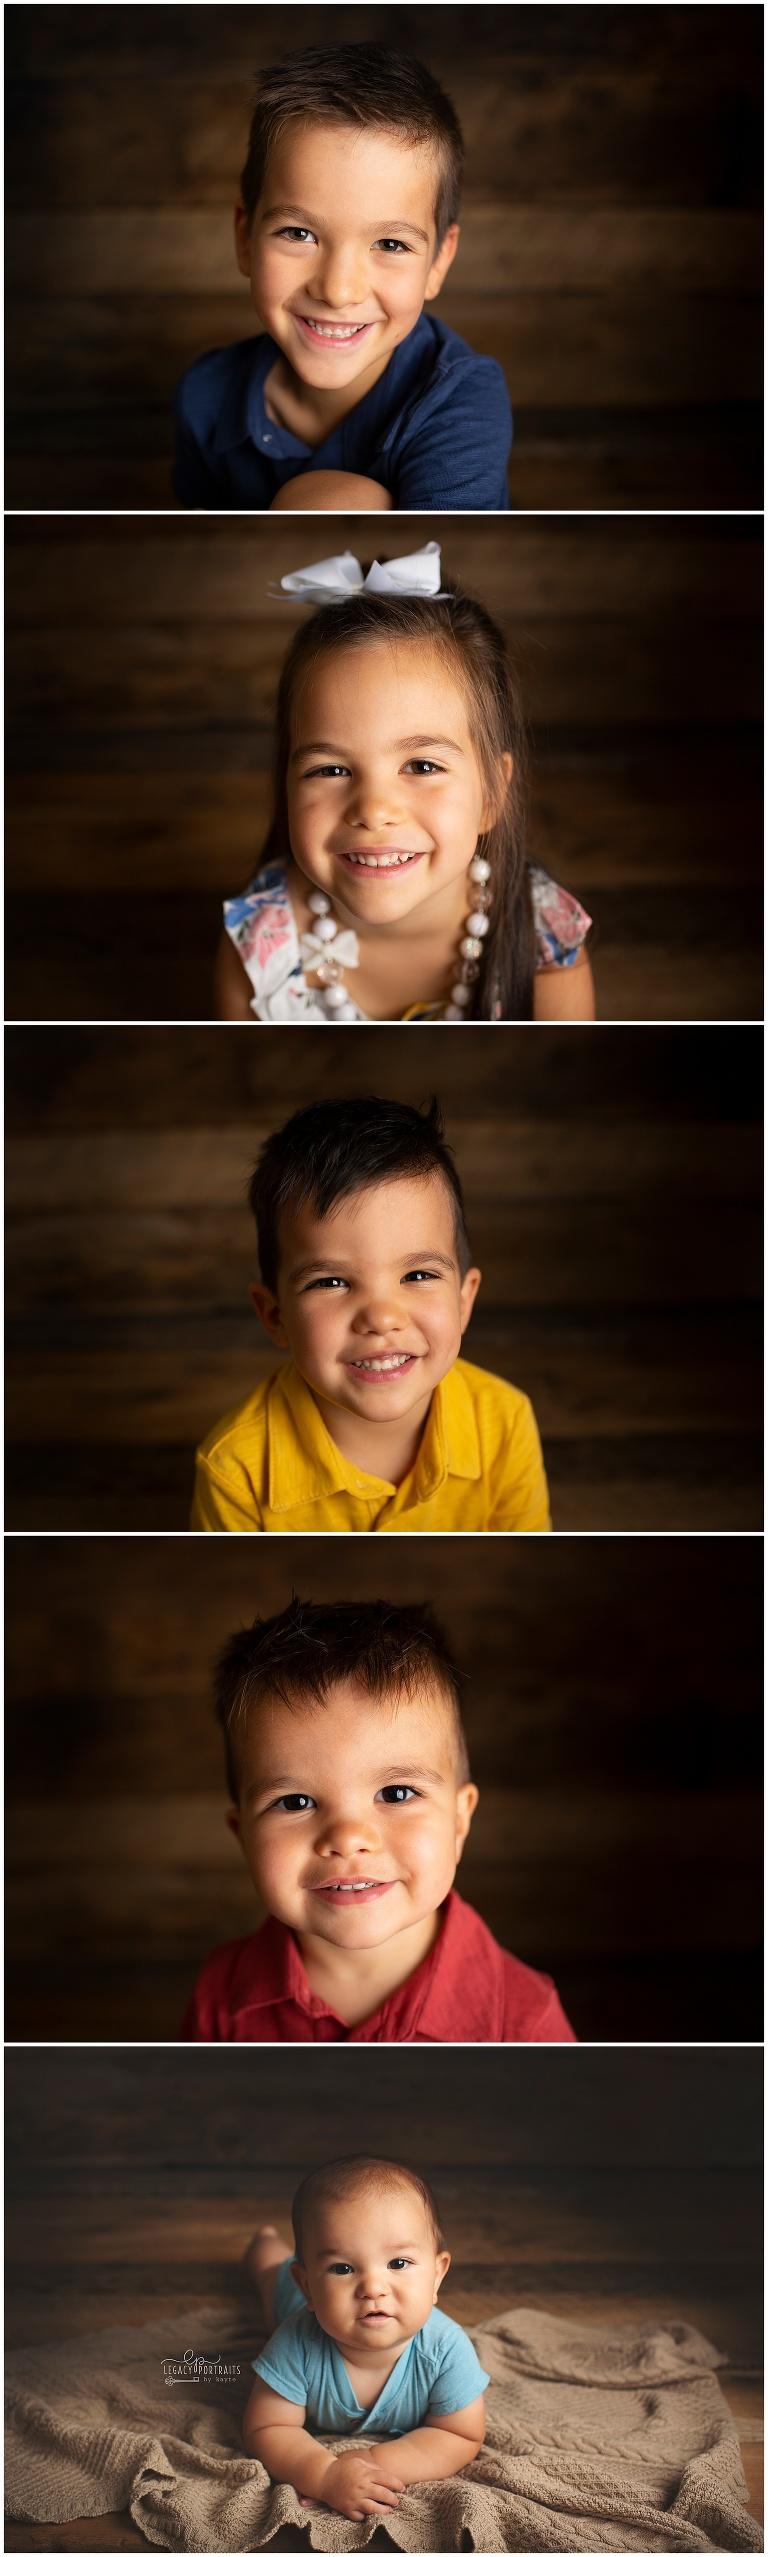 Fort Wayne Child Photographer | Legacy Portraits by Kayte | www.legacyportraitsbykayte.com